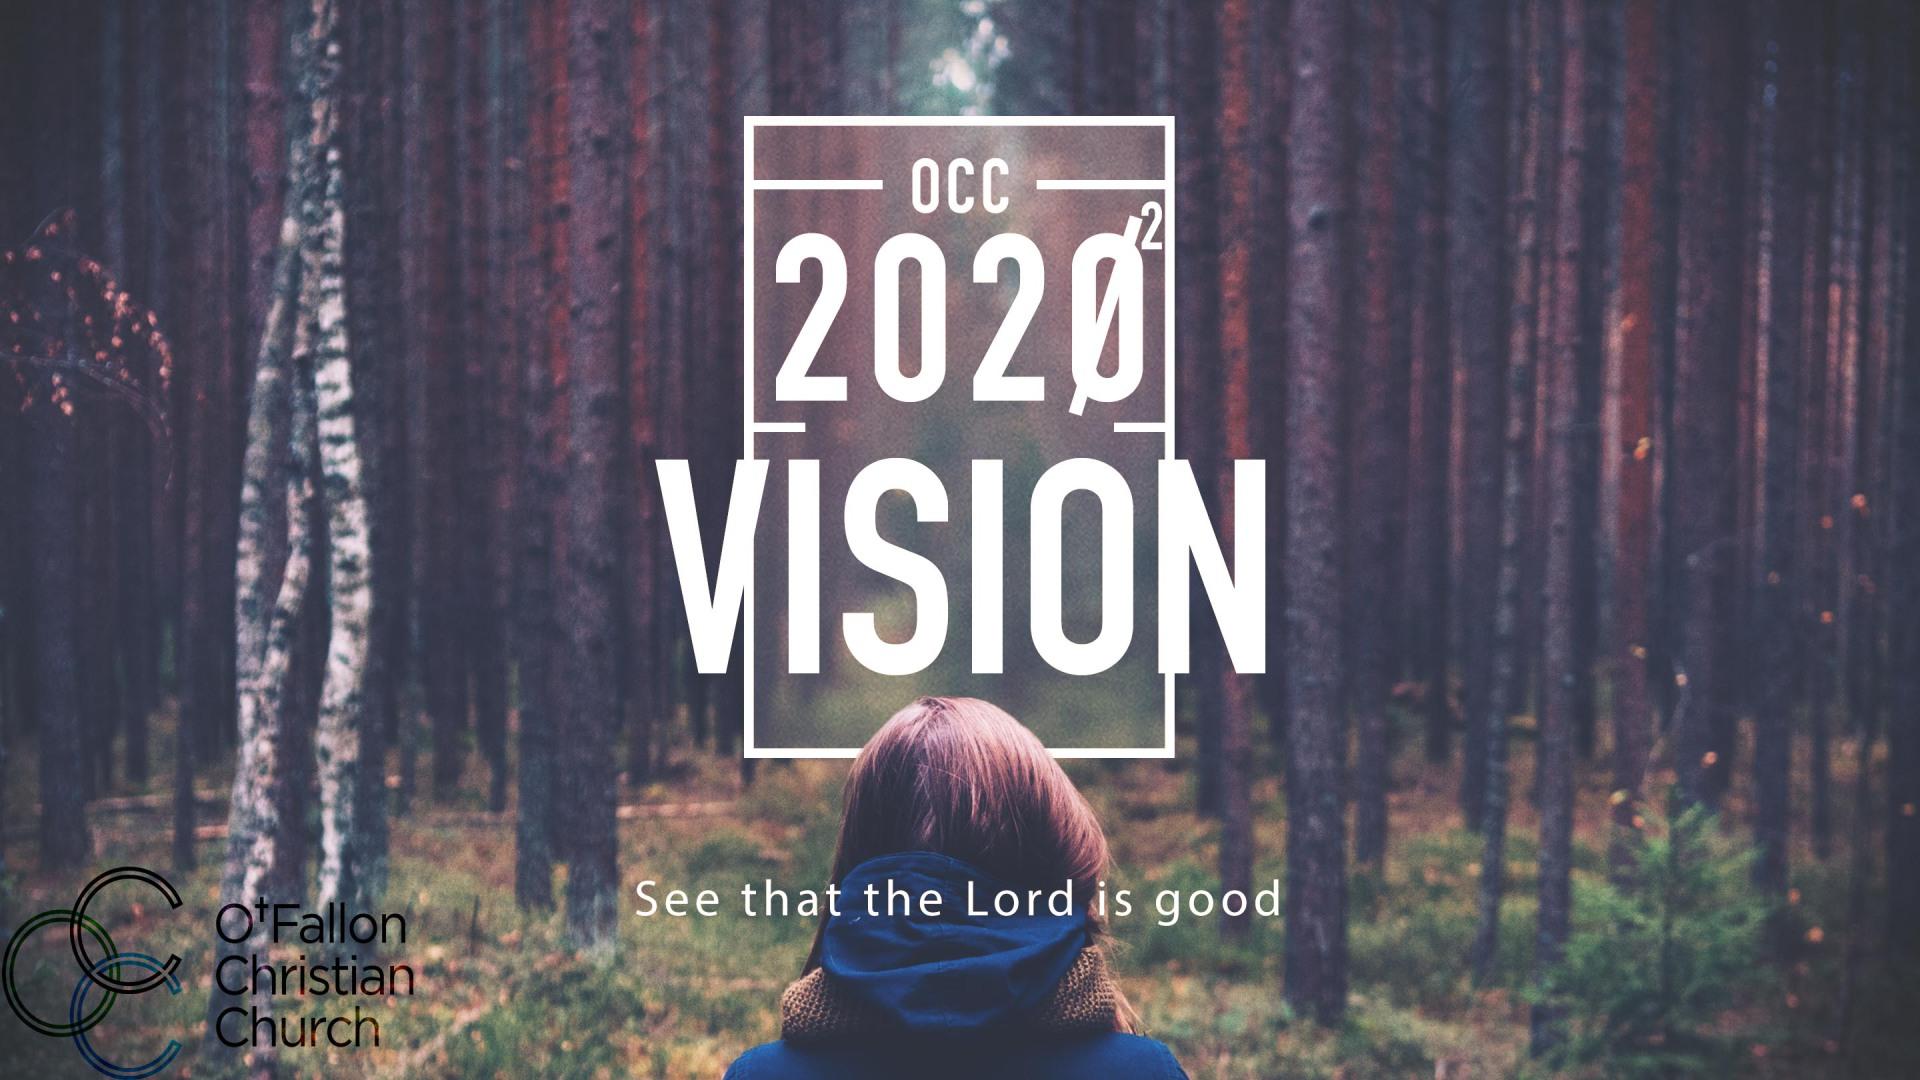 OCC Vision Series - November 2015